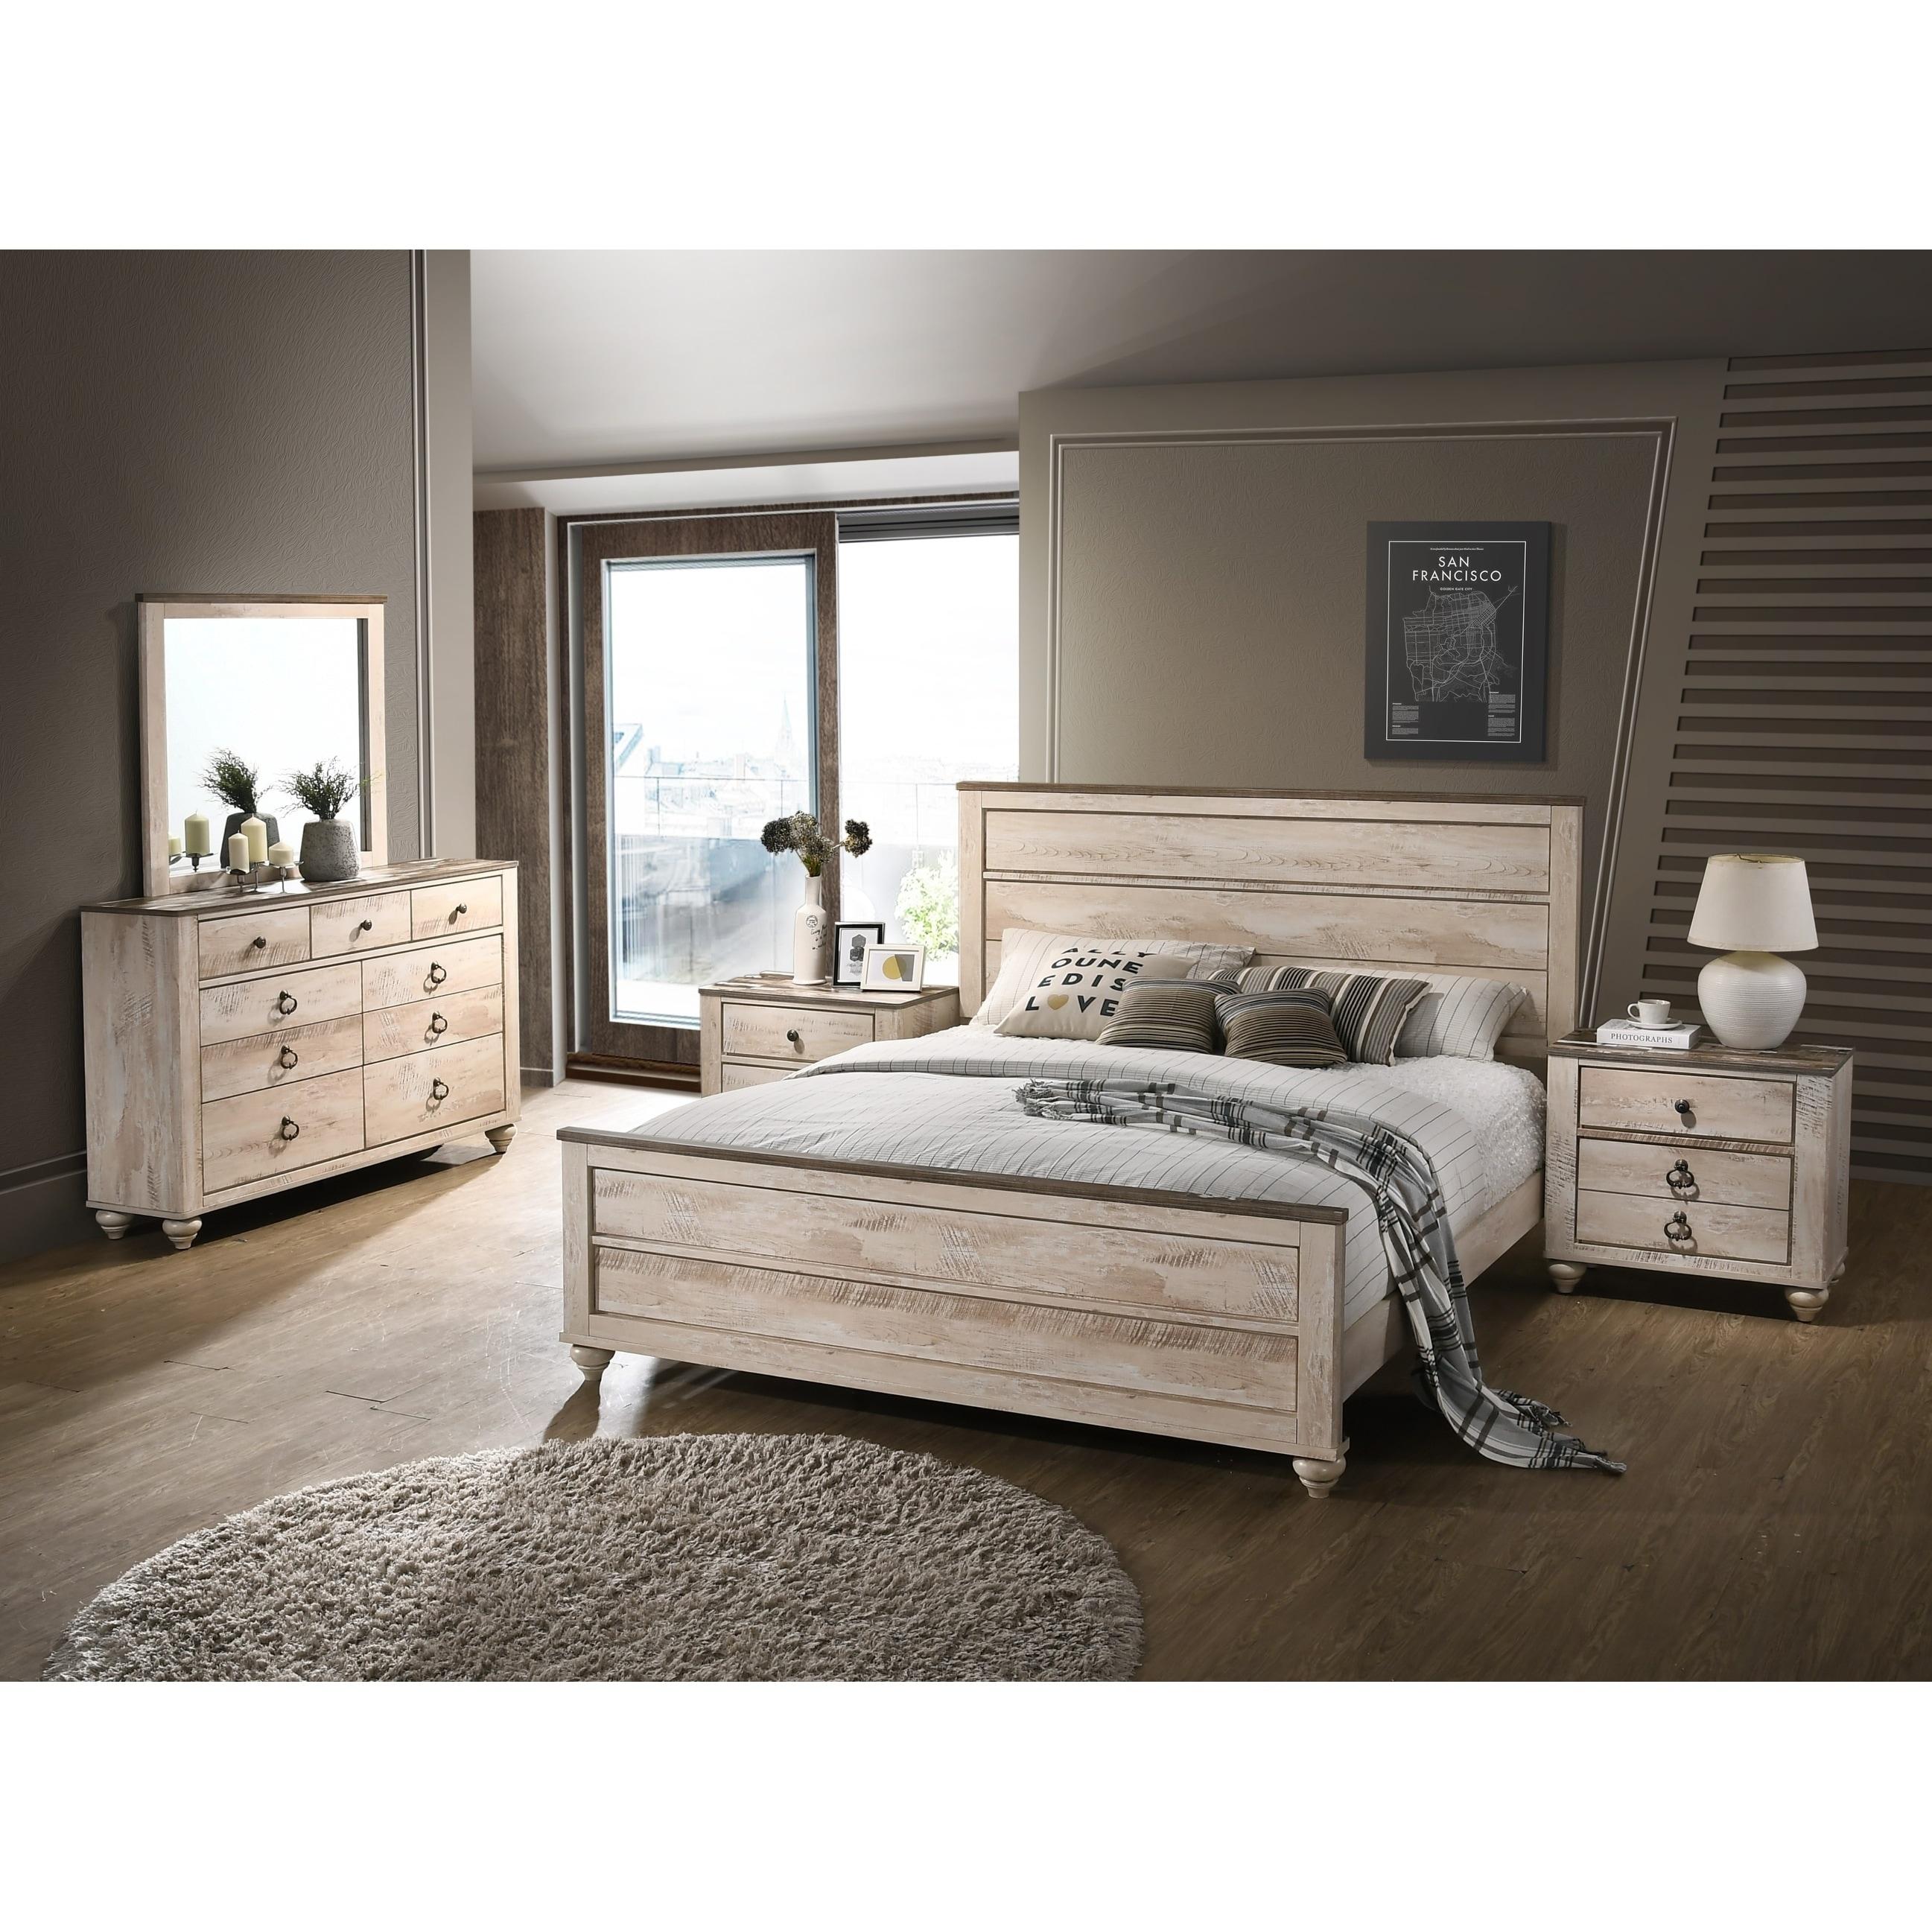 Shop Imerland Contemporary White Wash Finish 5-Piece Bedroom Set ...